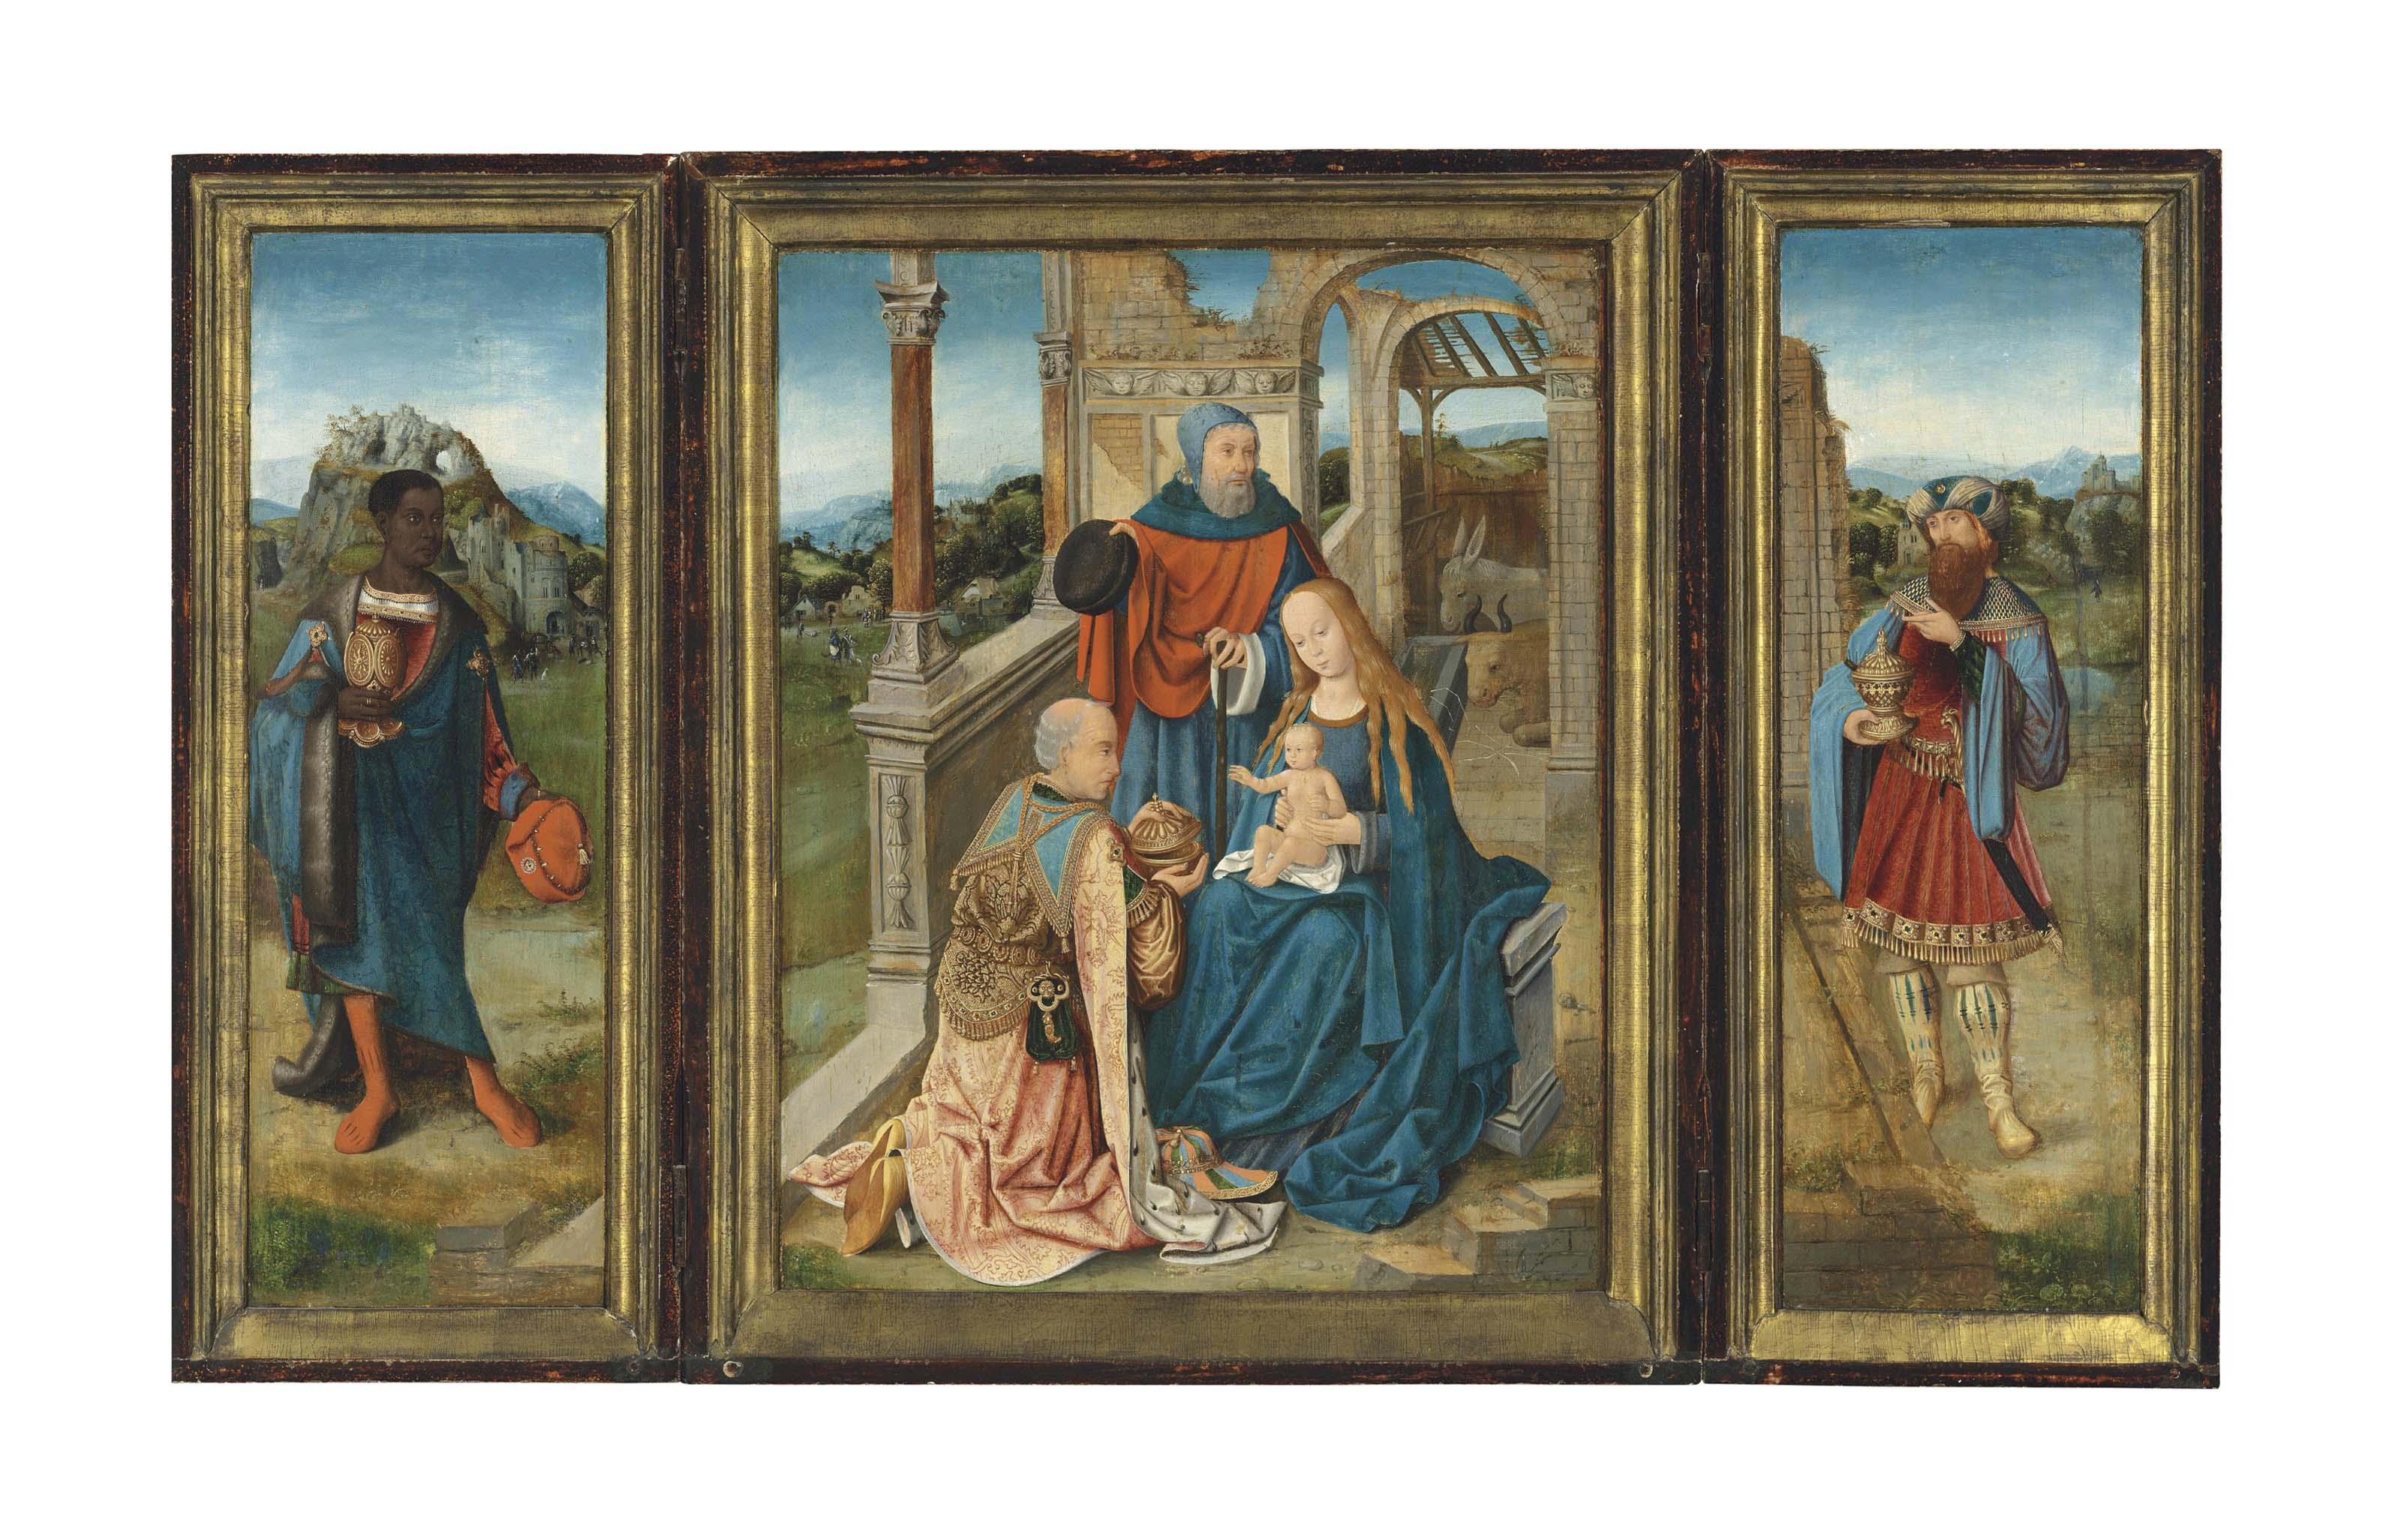 Antwerp School, circa 1520